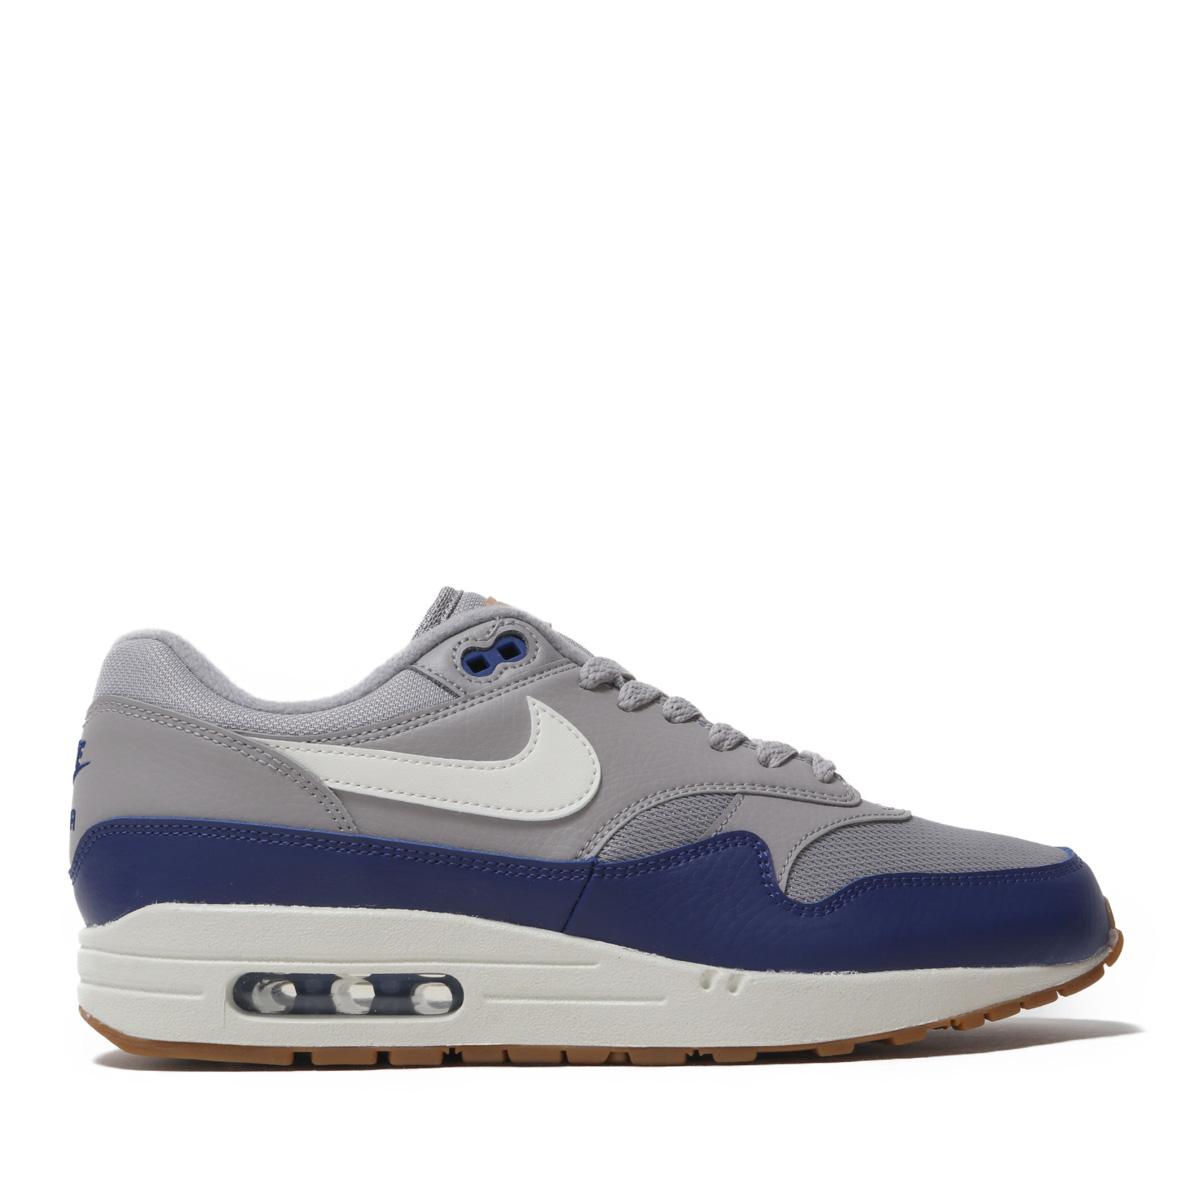 buy popular edc06 3c268 Nike Air Max 1 NSW Grey Sail Navy Mens Running Shoes NSW Sneakers AH8145-008  Clothing, ...